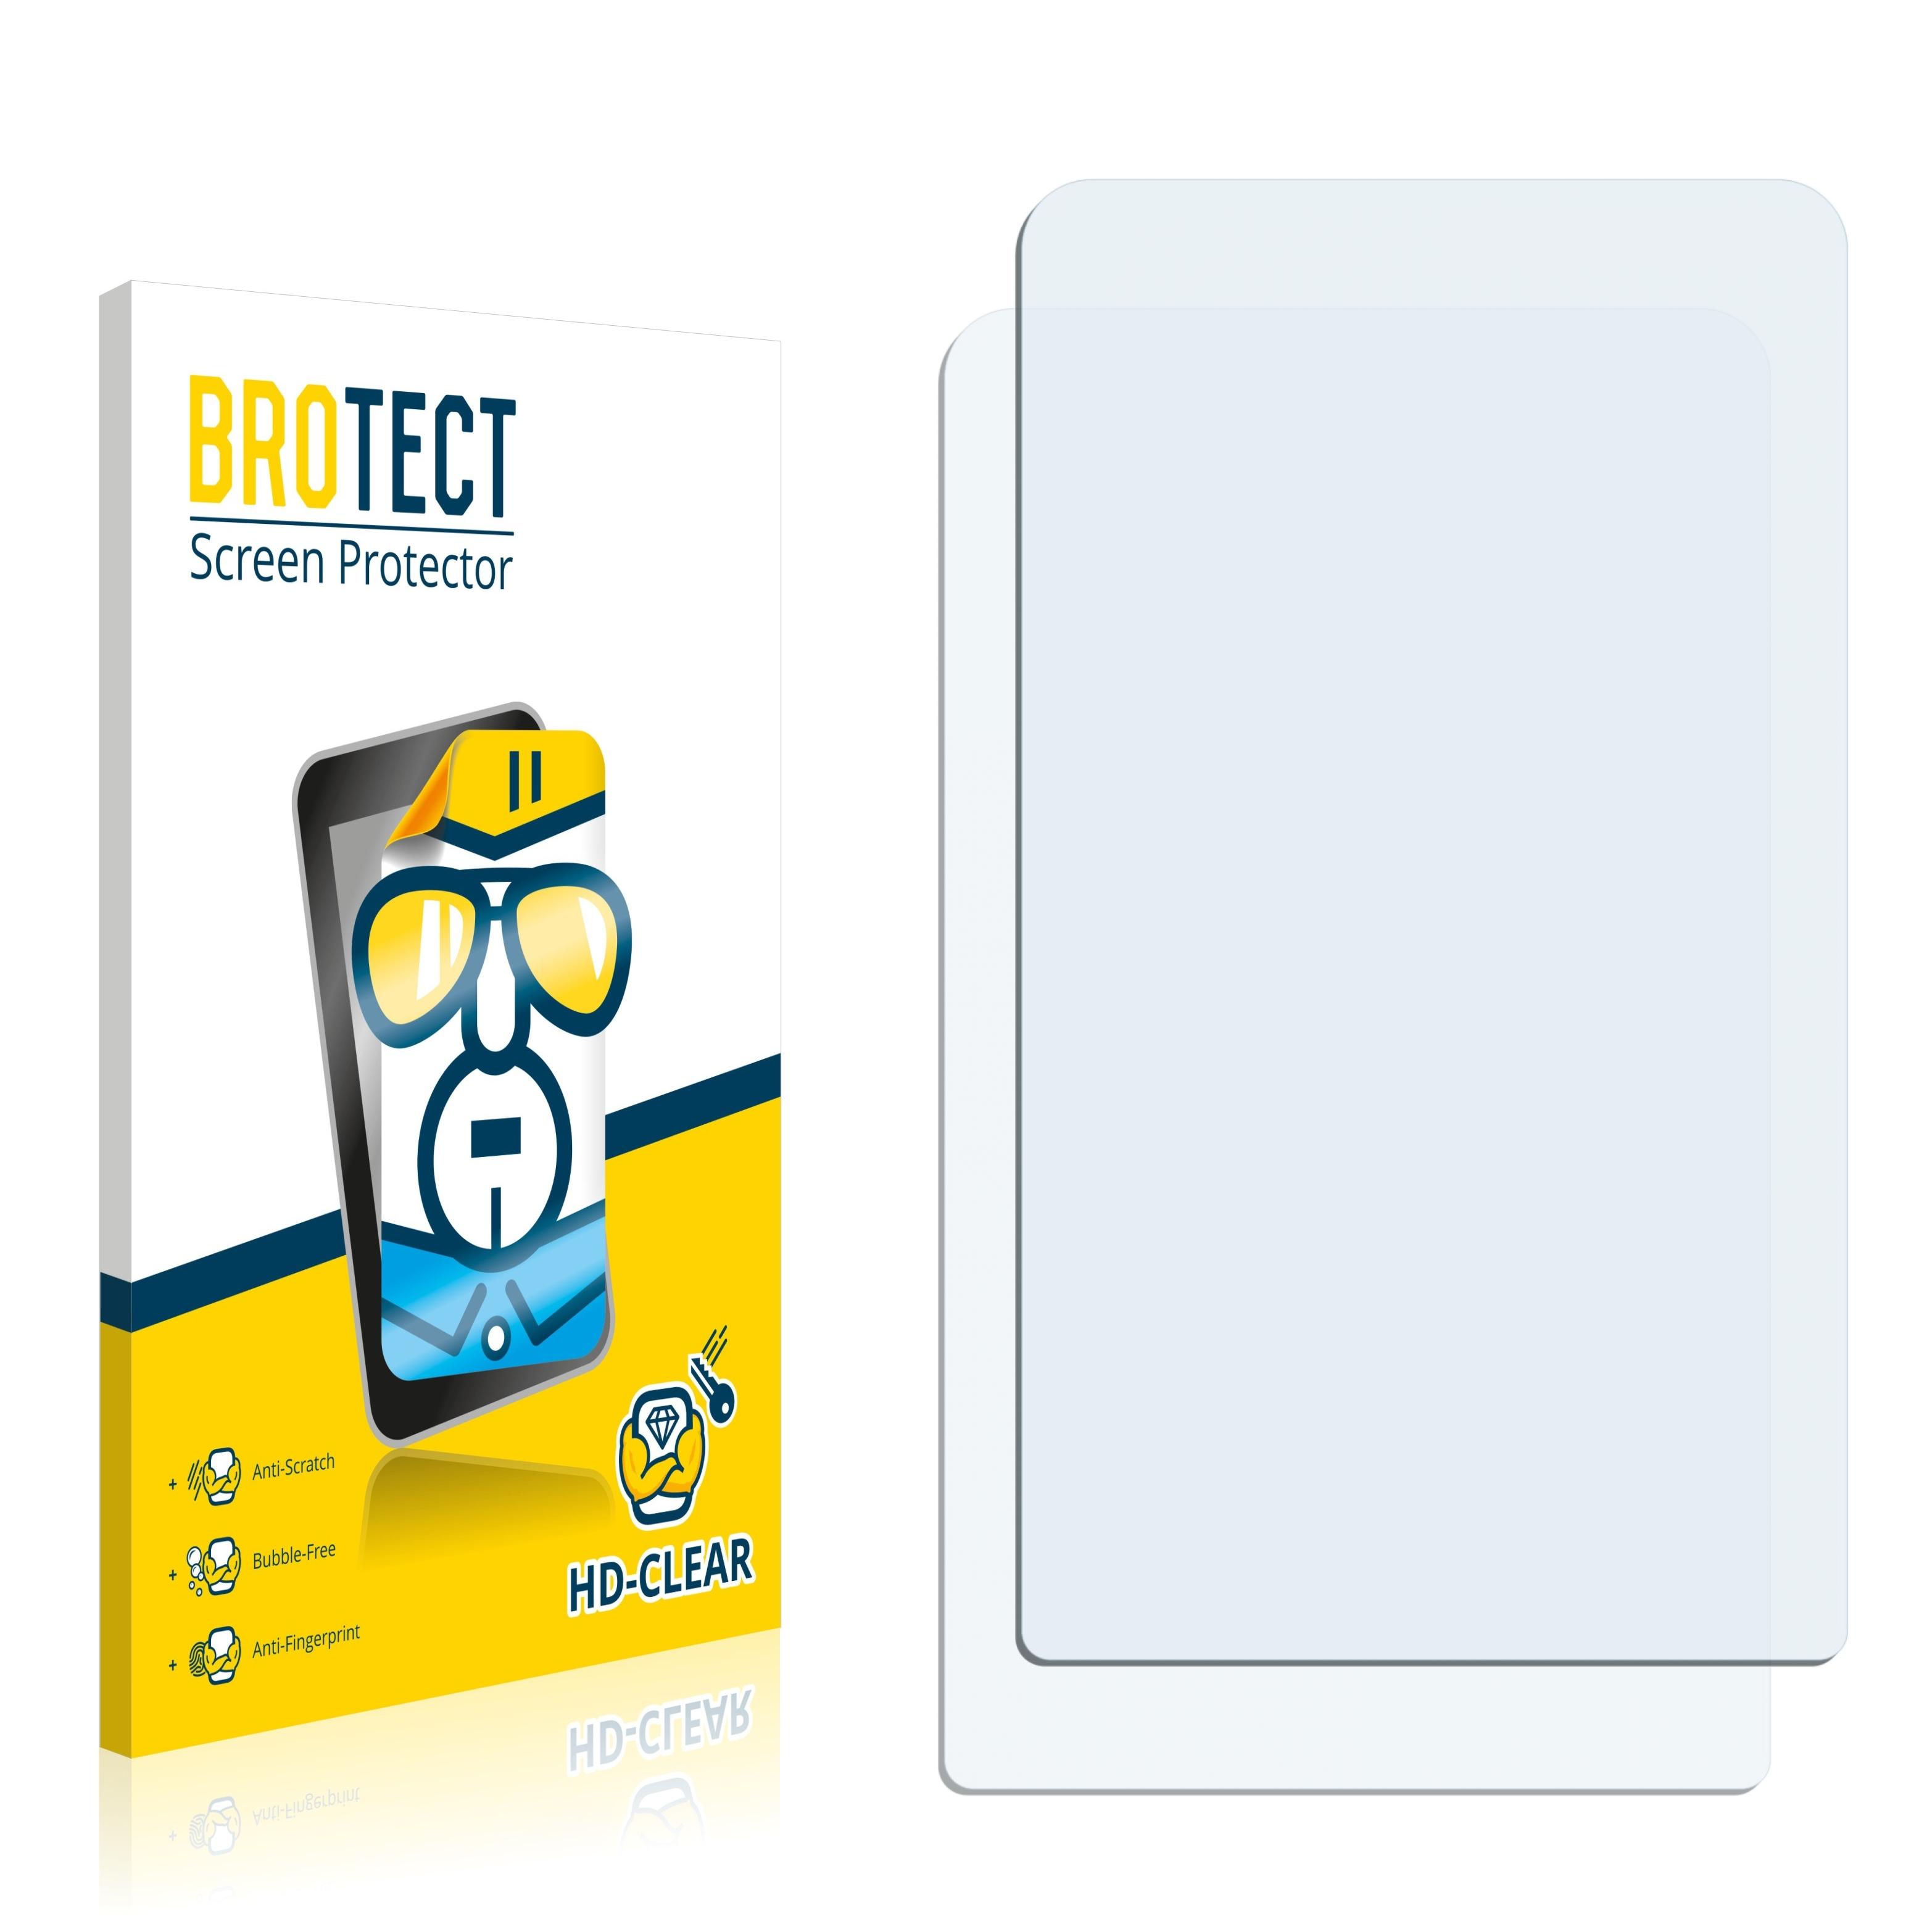 Film Protection Ultra Clair brotect 2-Pi/èces Protection Ecran Compatible avec Garmin DriveSmart 51 LMT-S